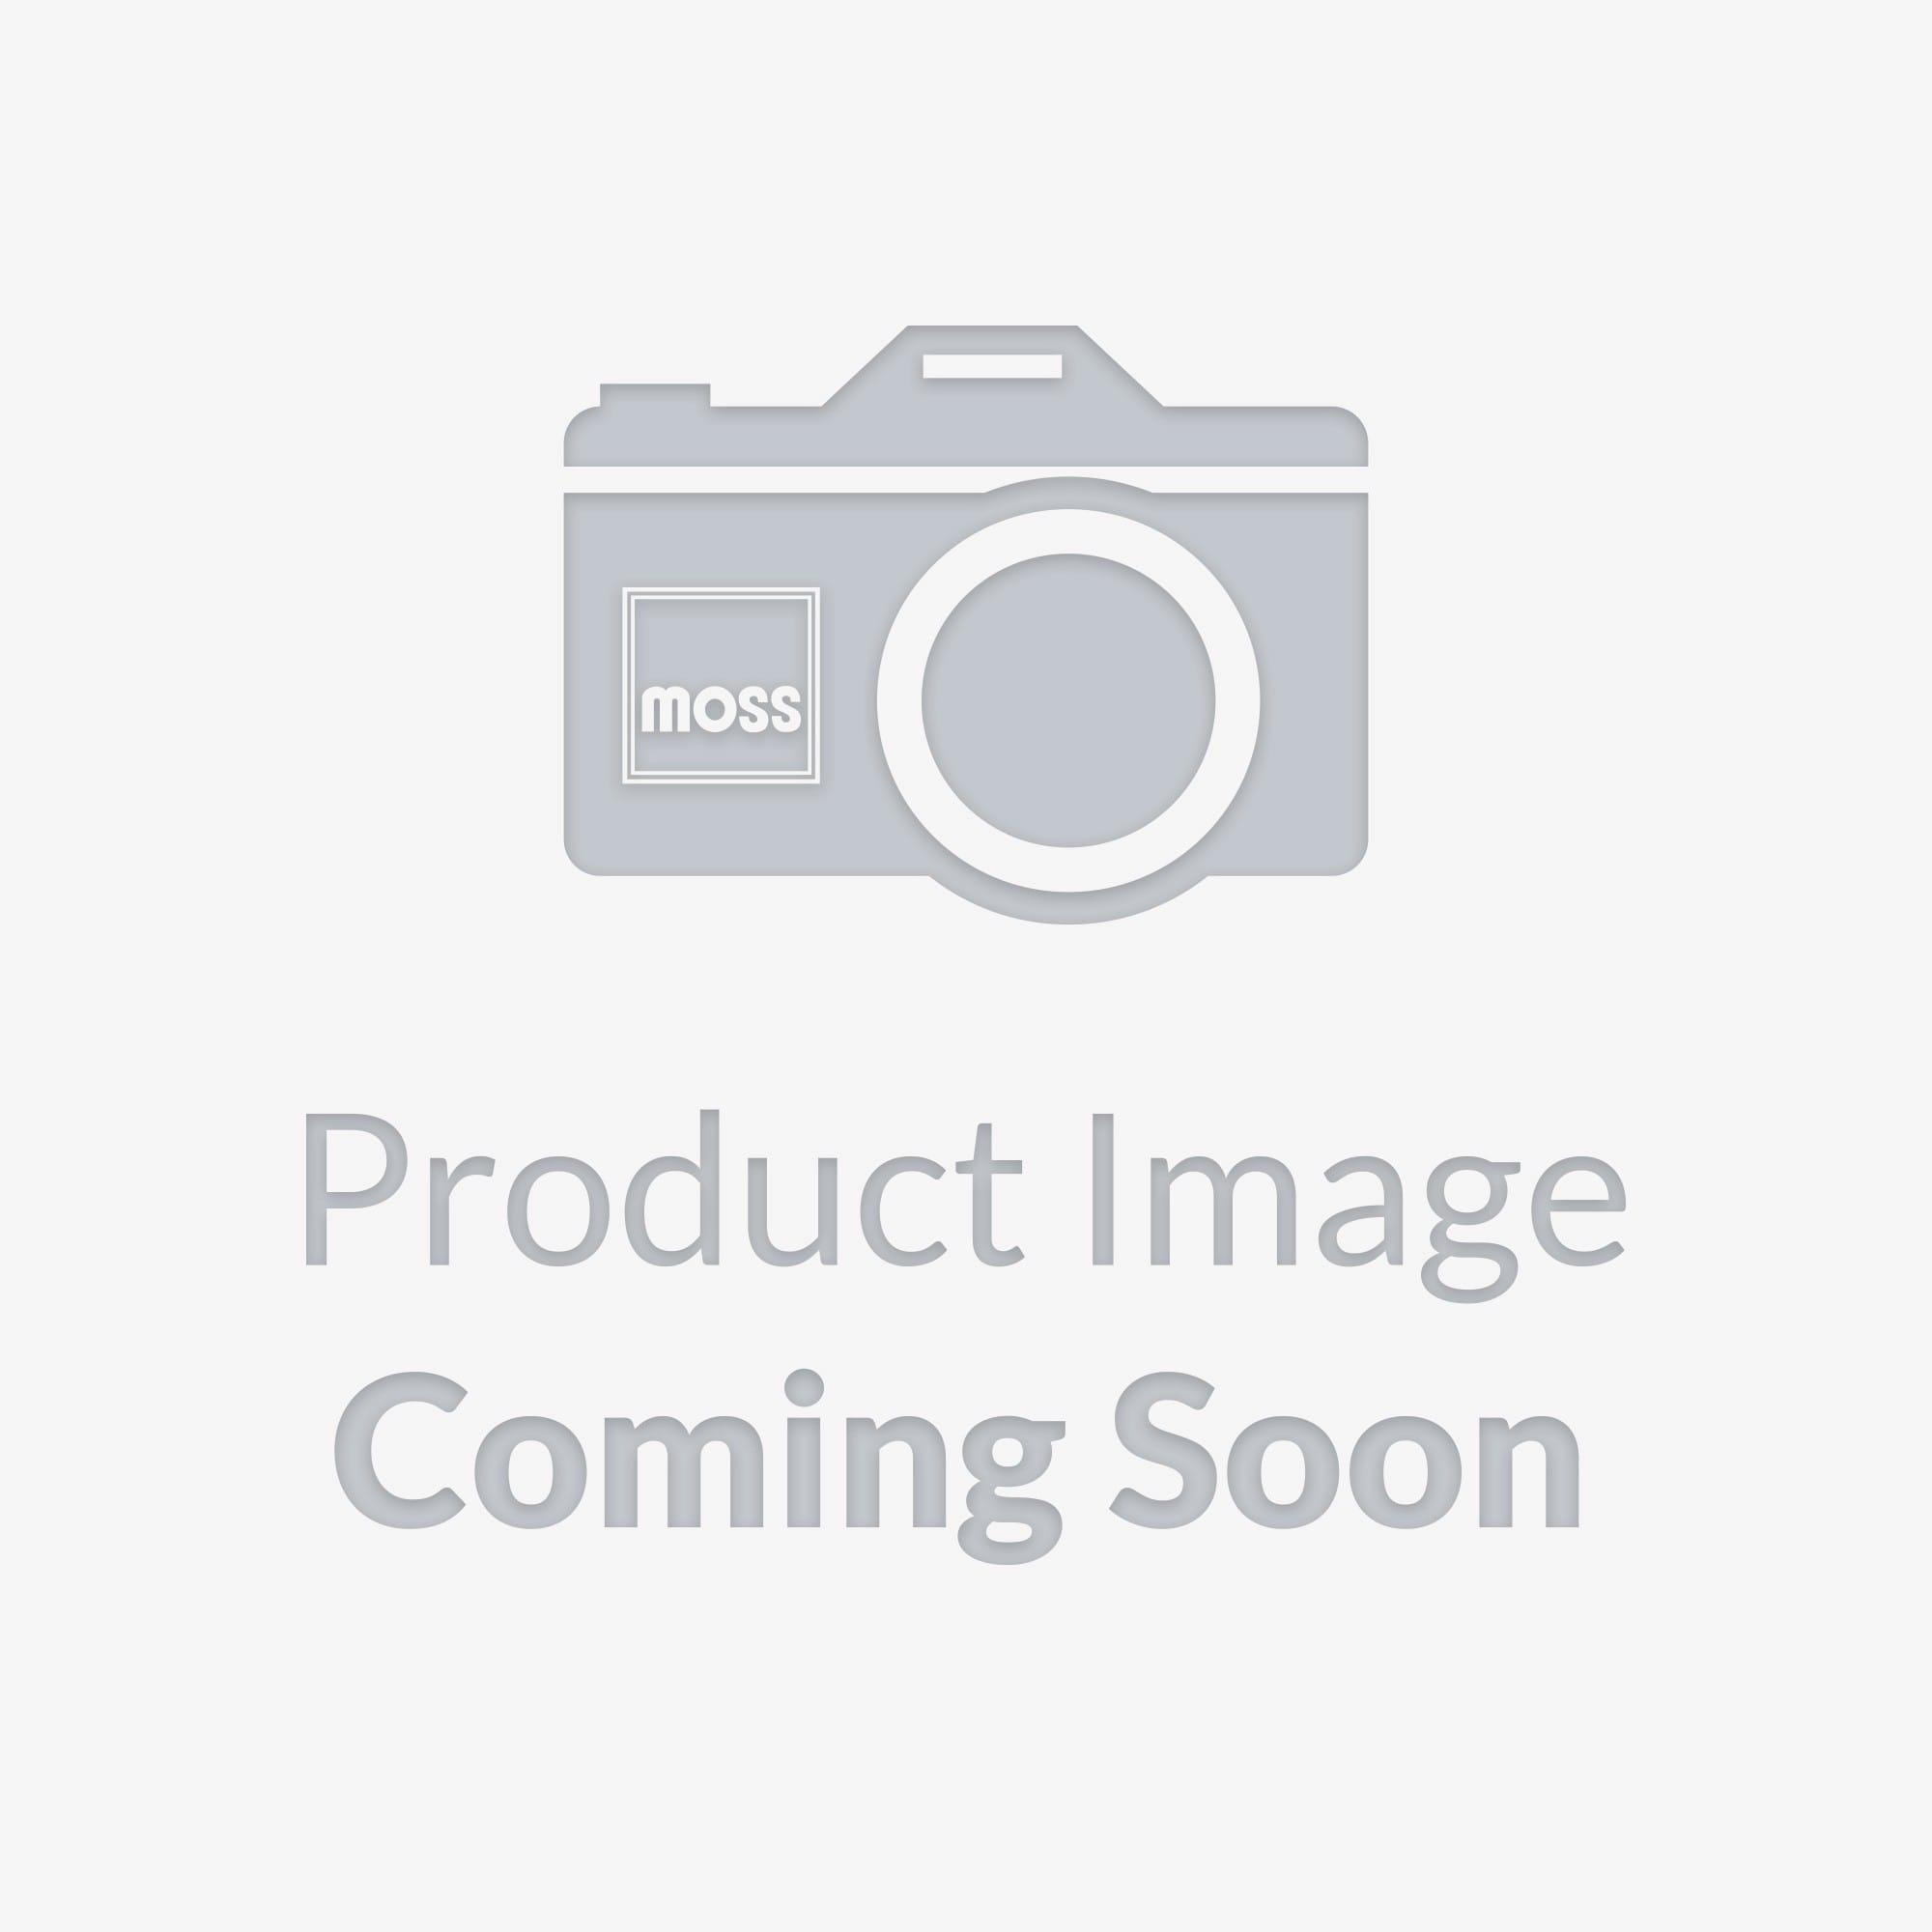 222 100 Headlamp Stoneguards